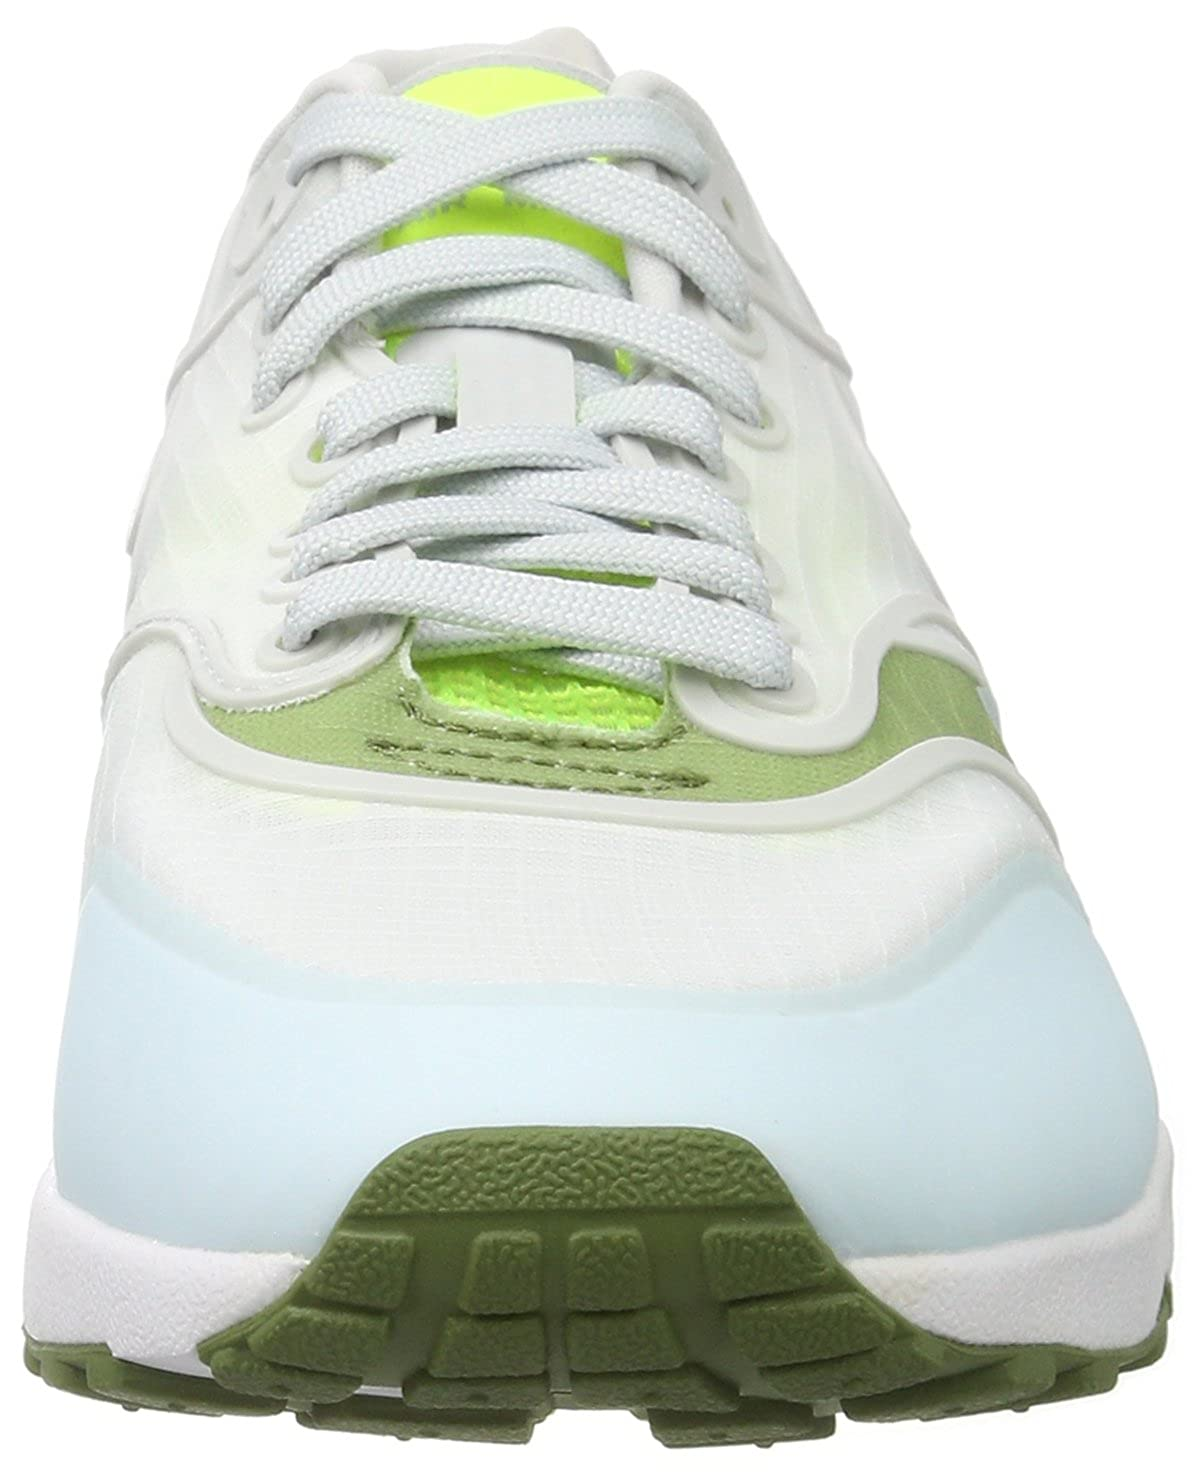 los angeles f39d3 ba445 Nike Women s WMNS Air Max 1 Ultra 2.0 Si Gymnastics Shoes  Amazon.co.uk   Shoes   Bags